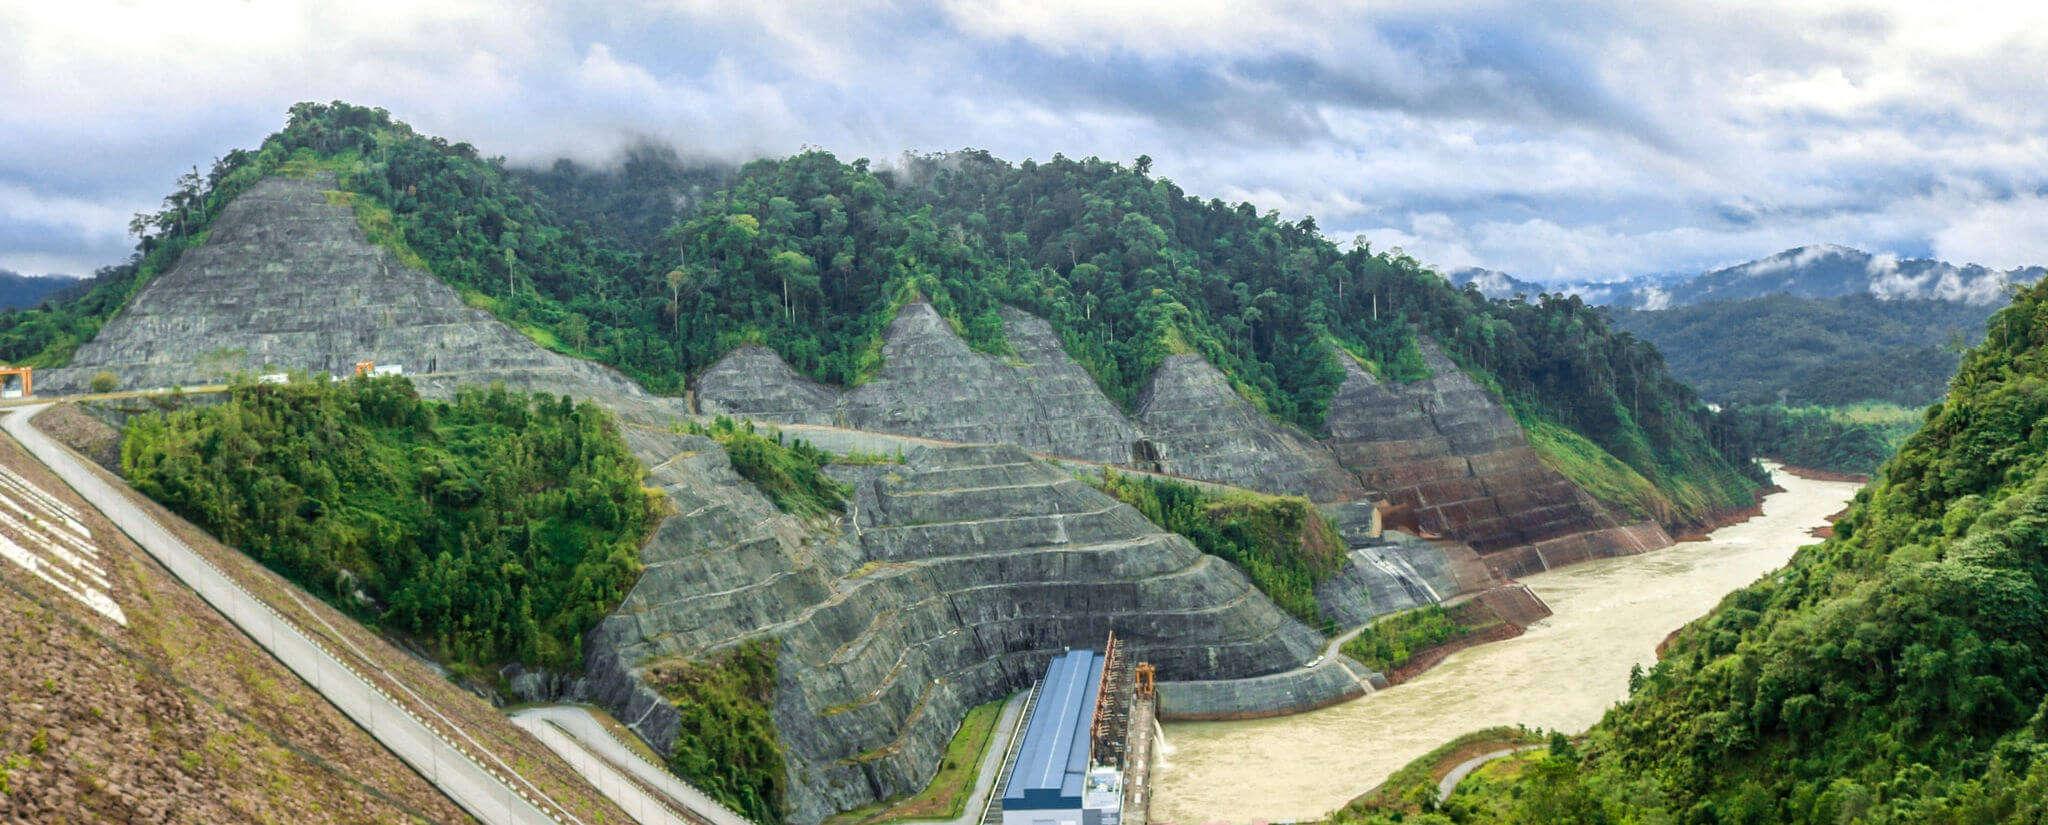 Tailing Dam Monitoring | Drone Survey | Mining Operation